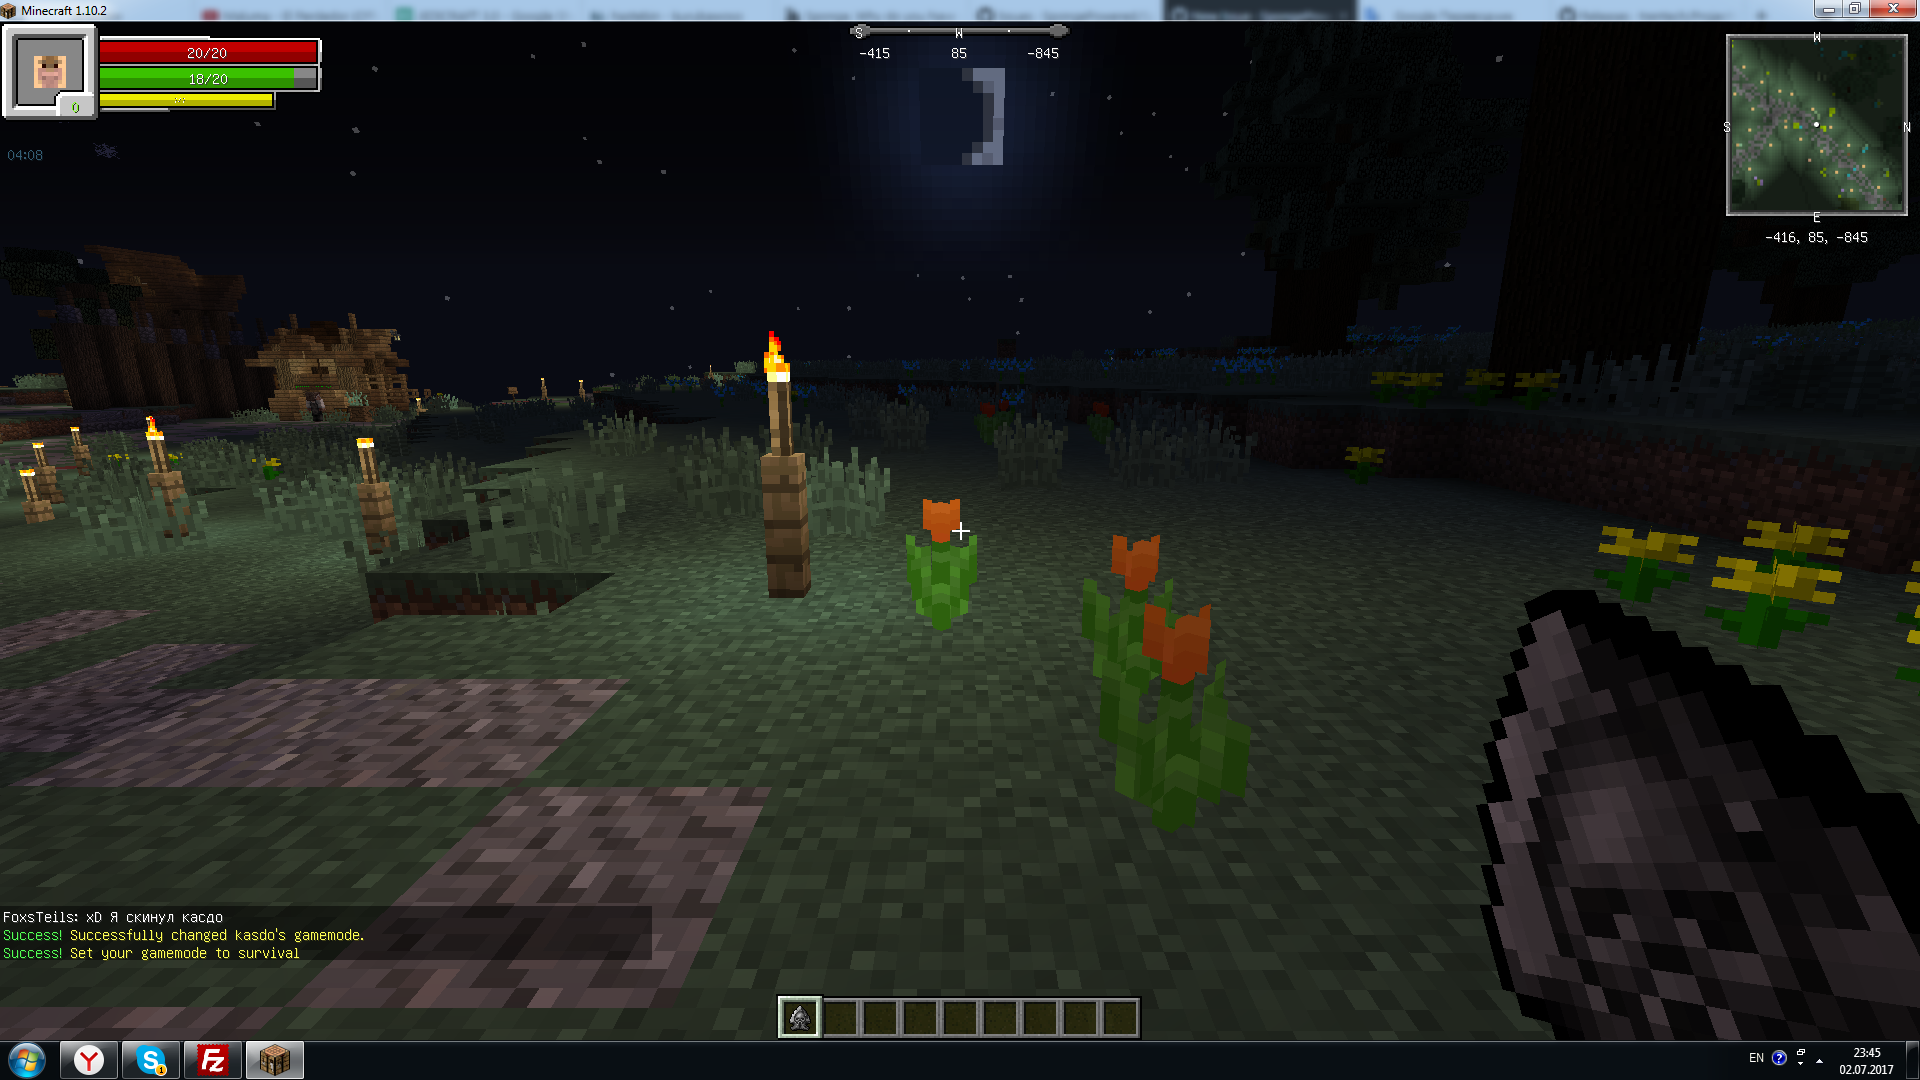 minecraft 1.10.2 duplication glitch